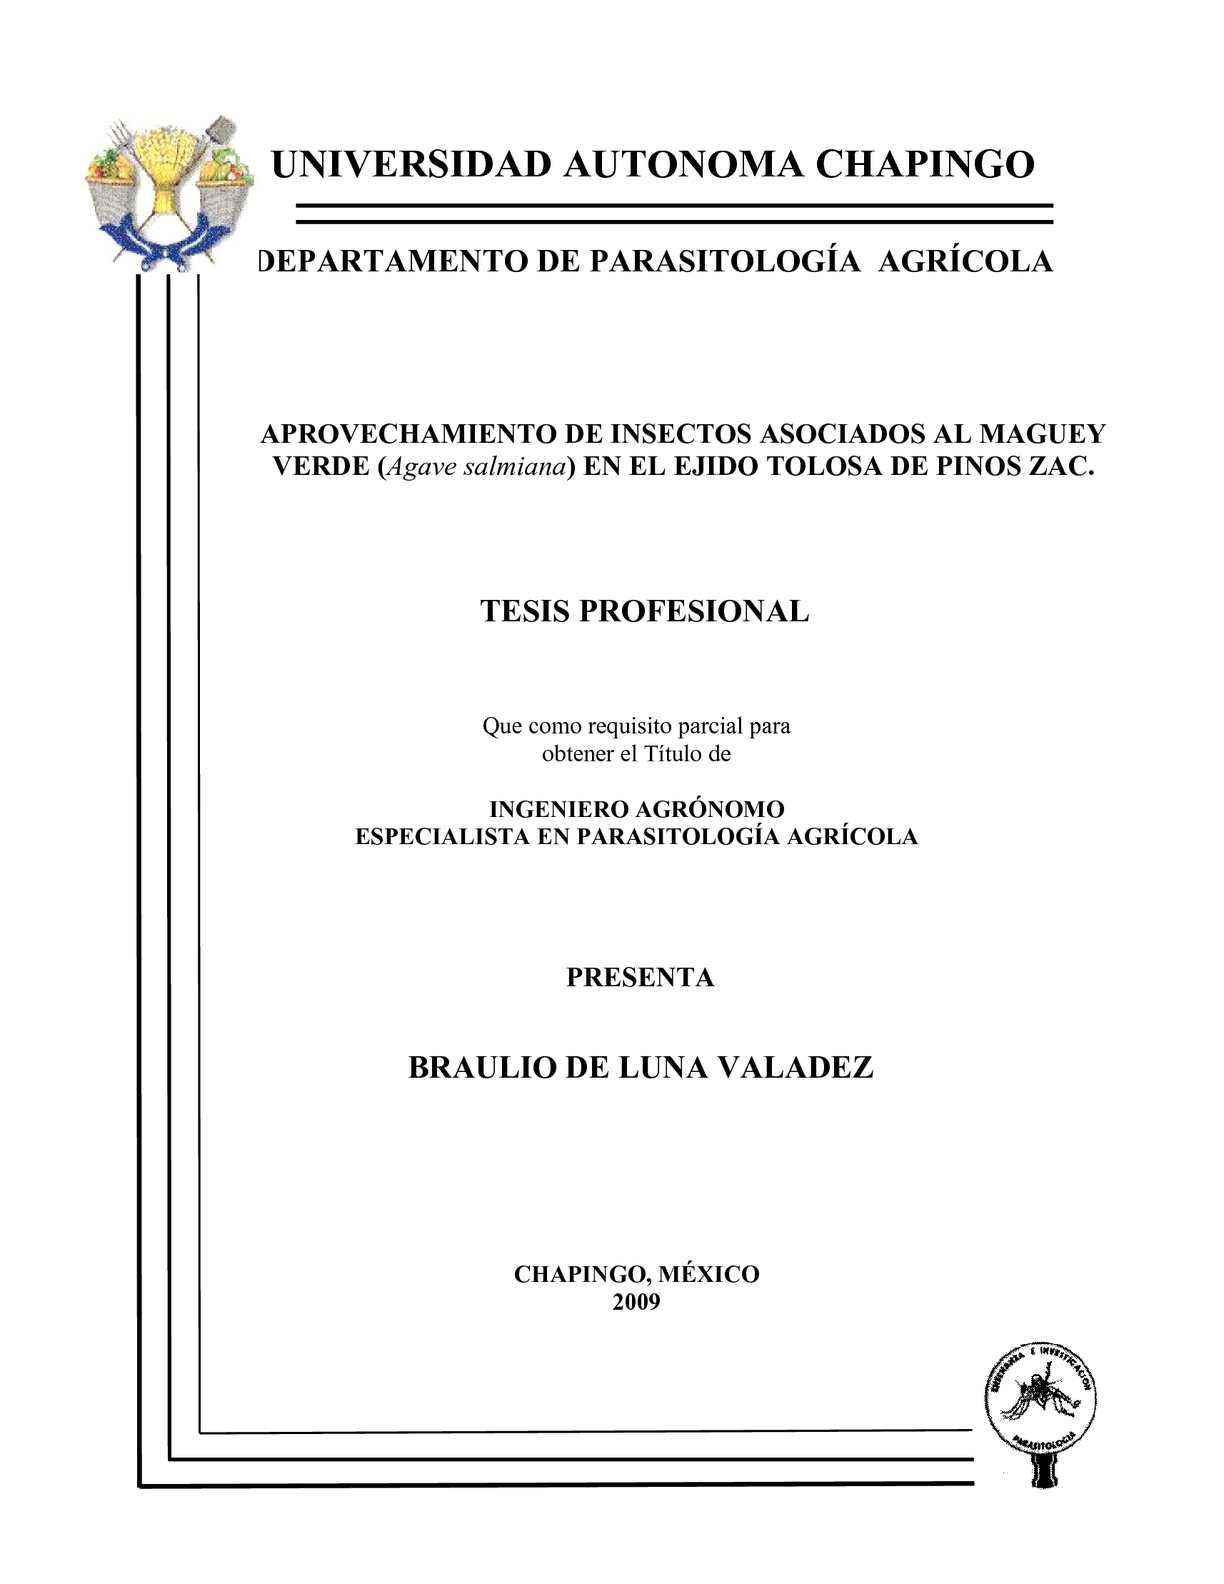 parasitología chapingo